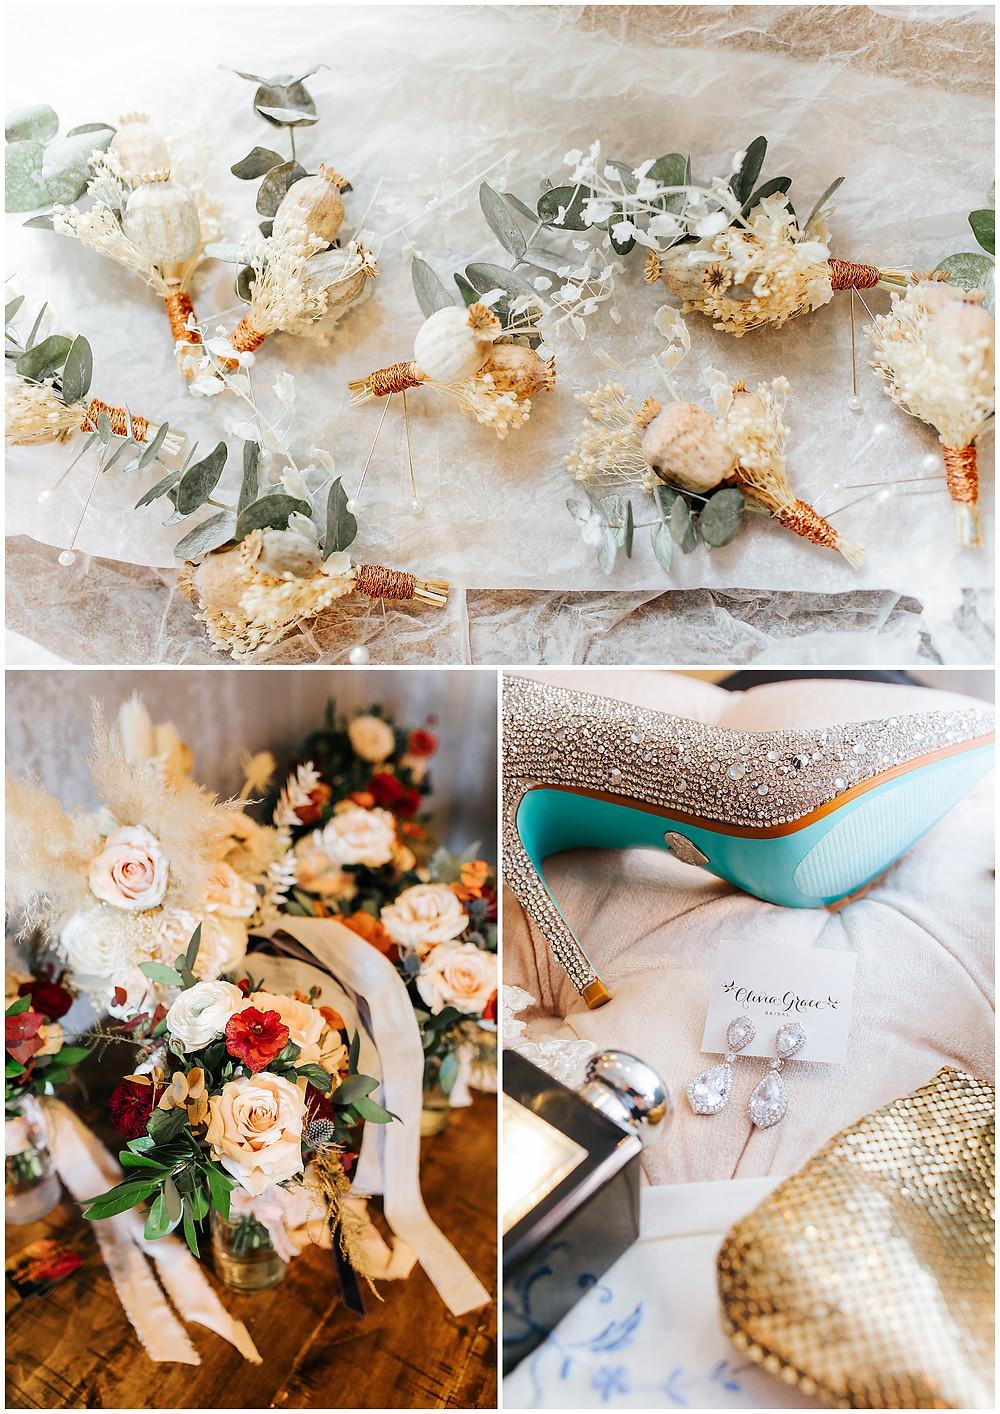 Park 31 Wedding | Boerne Wedding Photographer | Snap Chic Photography | San Antonio Wedding Photographer